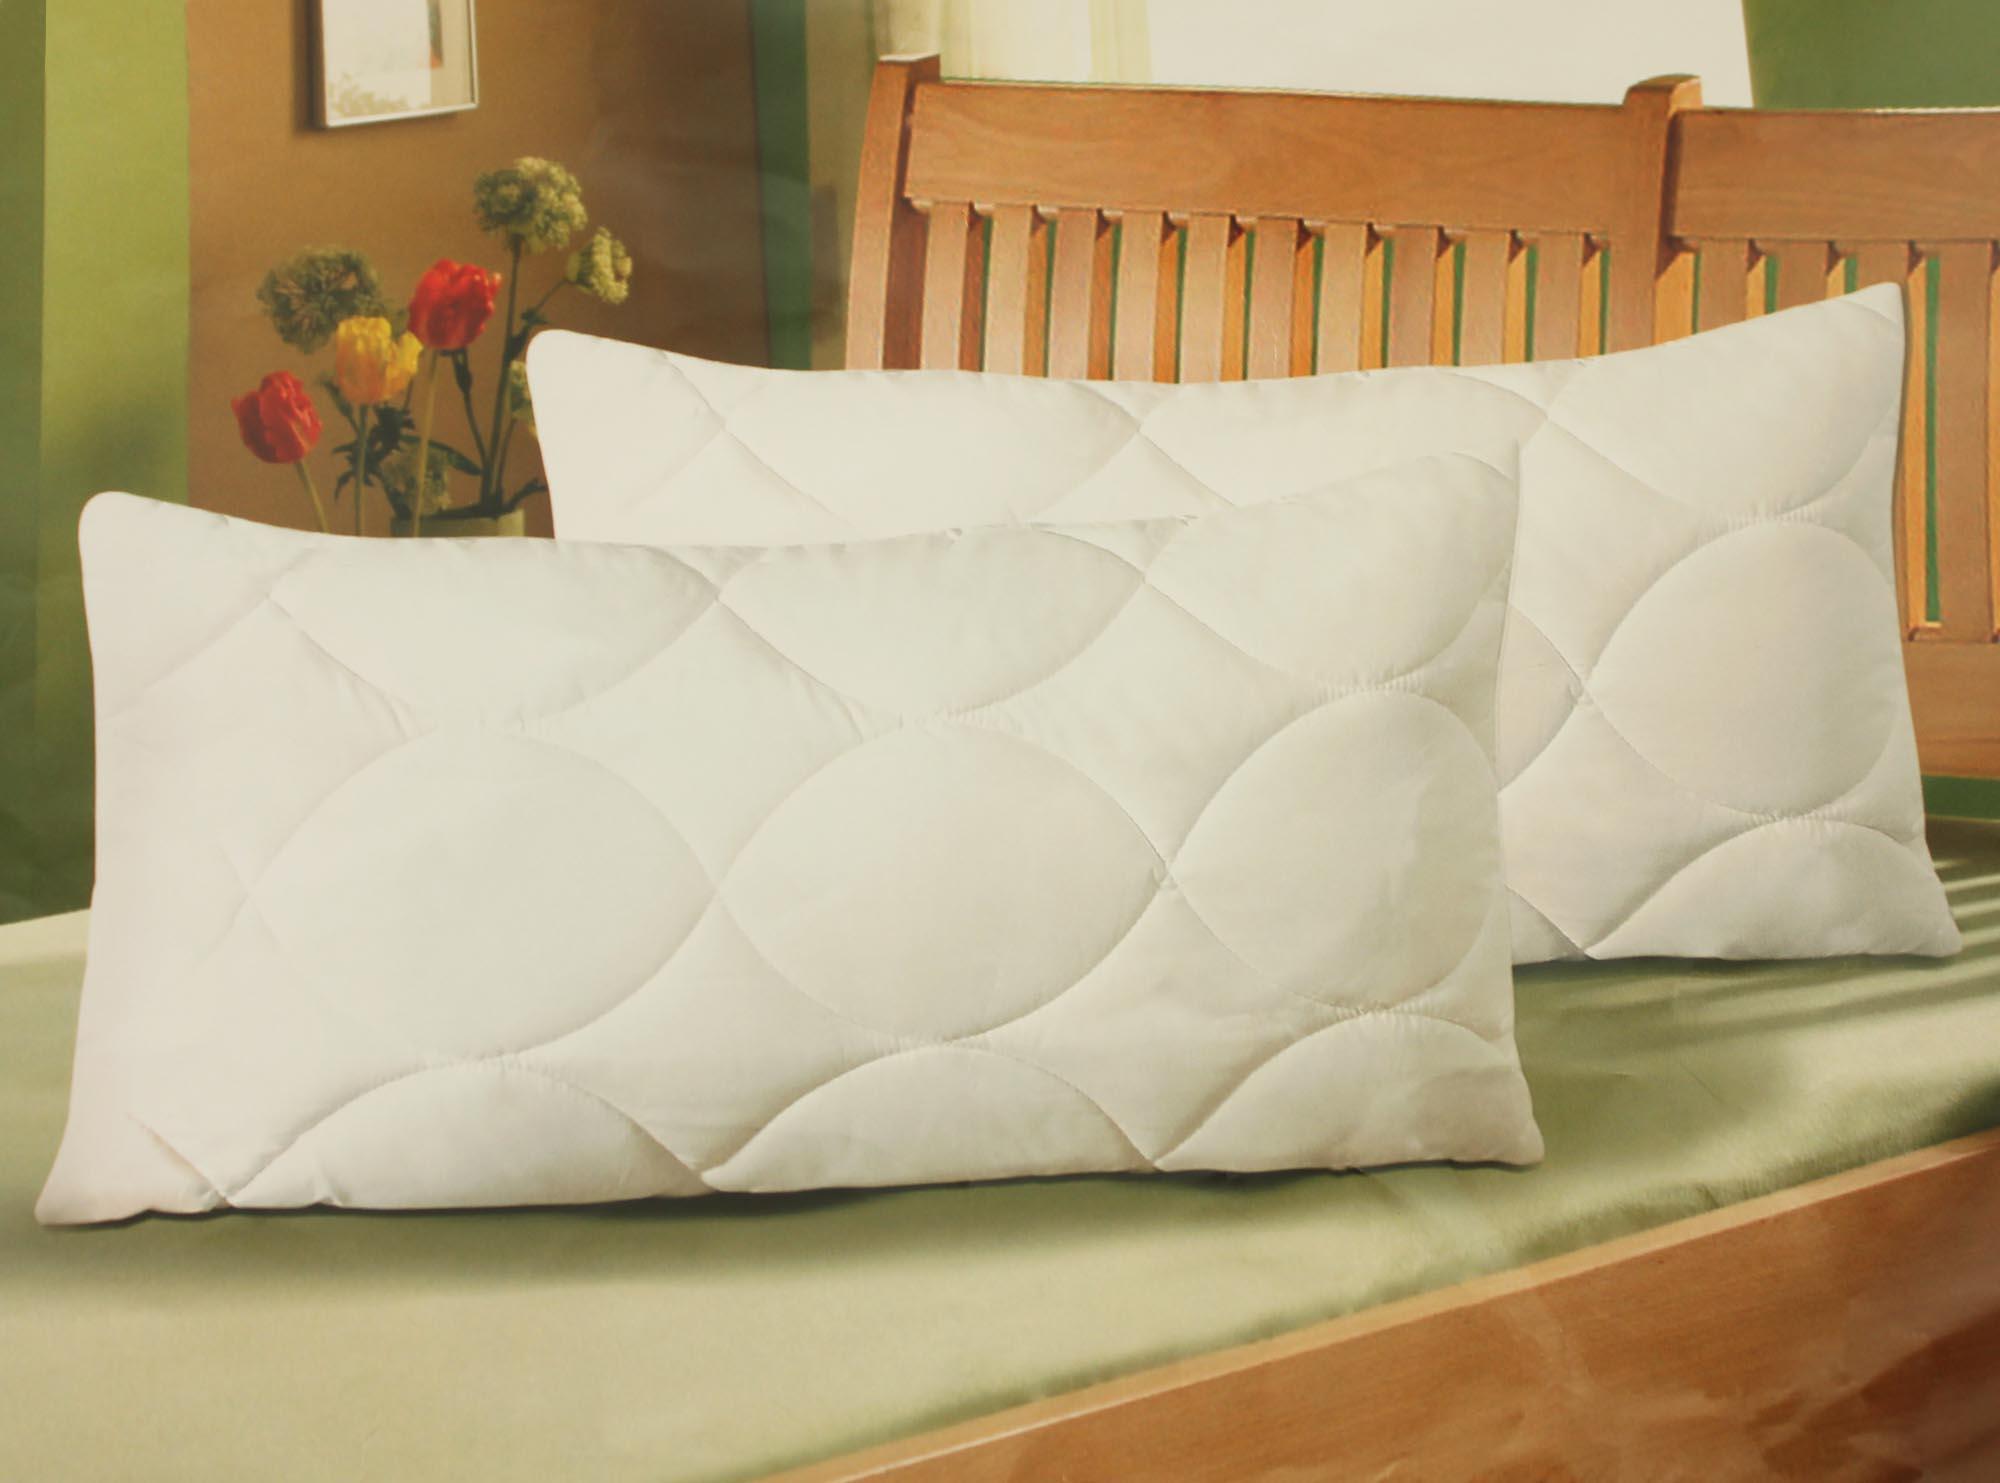 2er pack ko tex kopfkissen kissen tencel f r allergiker geeignet 40x80cm ebay. Black Bedroom Furniture Sets. Home Design Ideas